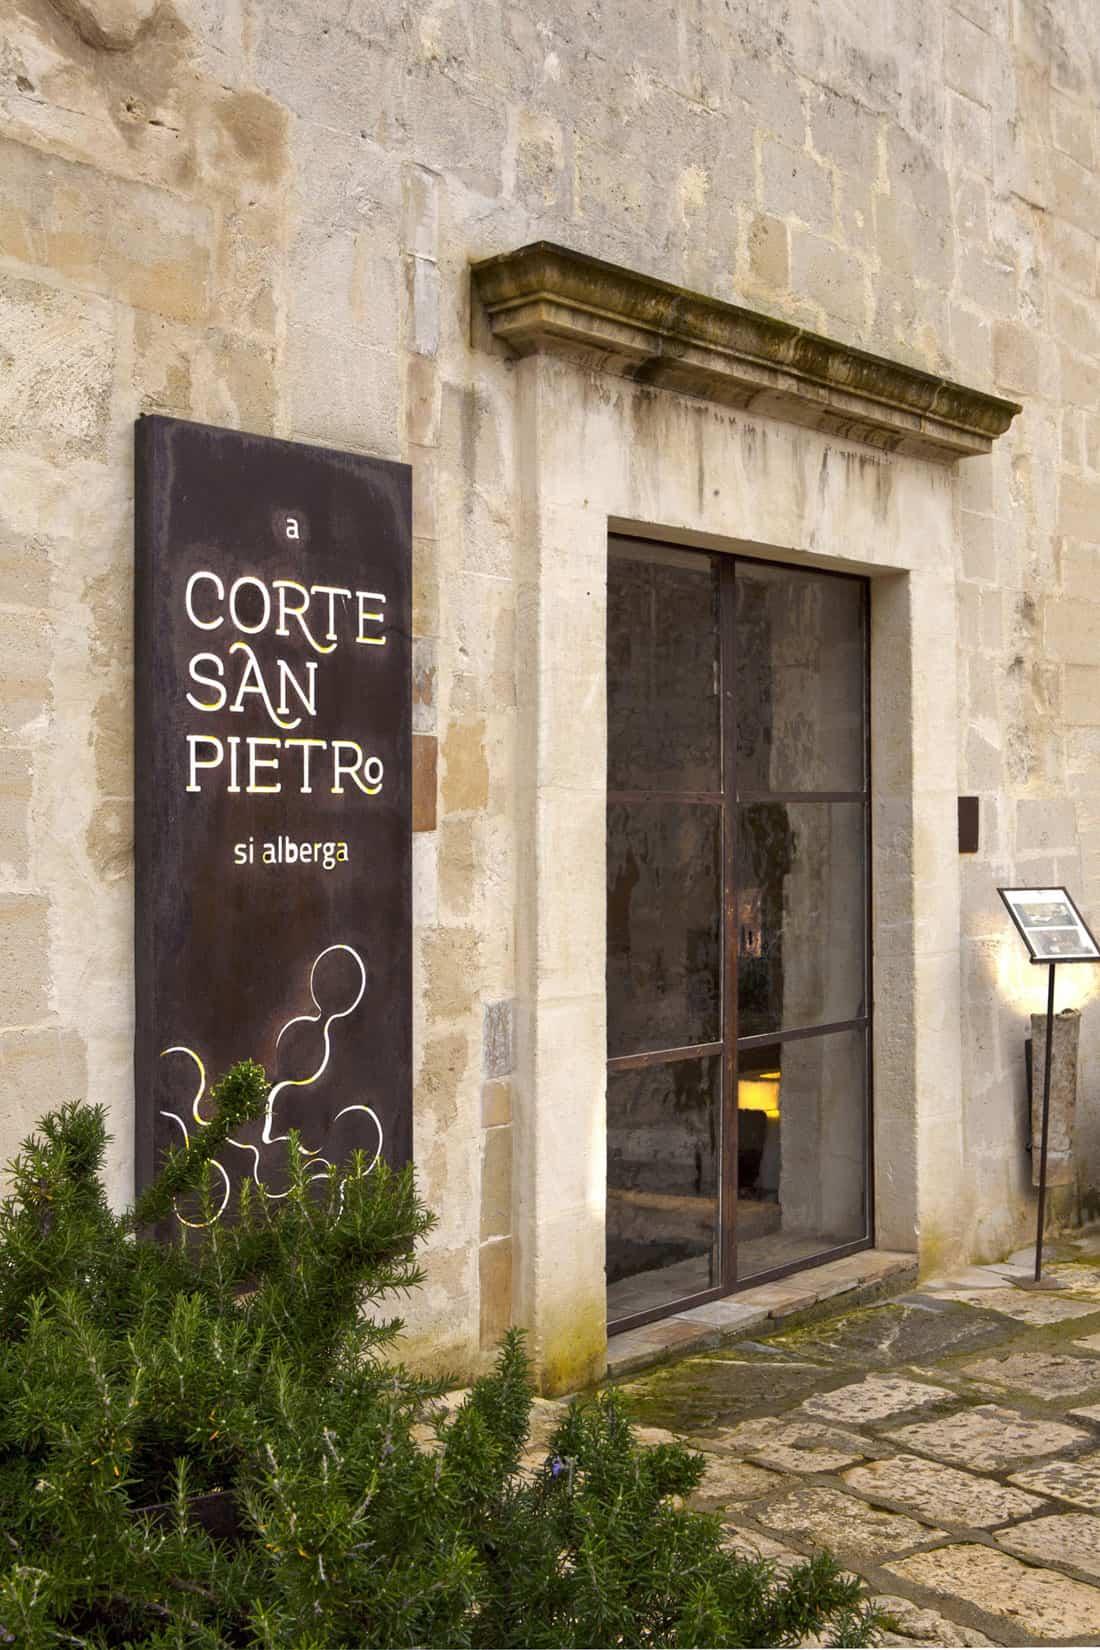 Corte San Pietro by Daniela Amoroso (1)